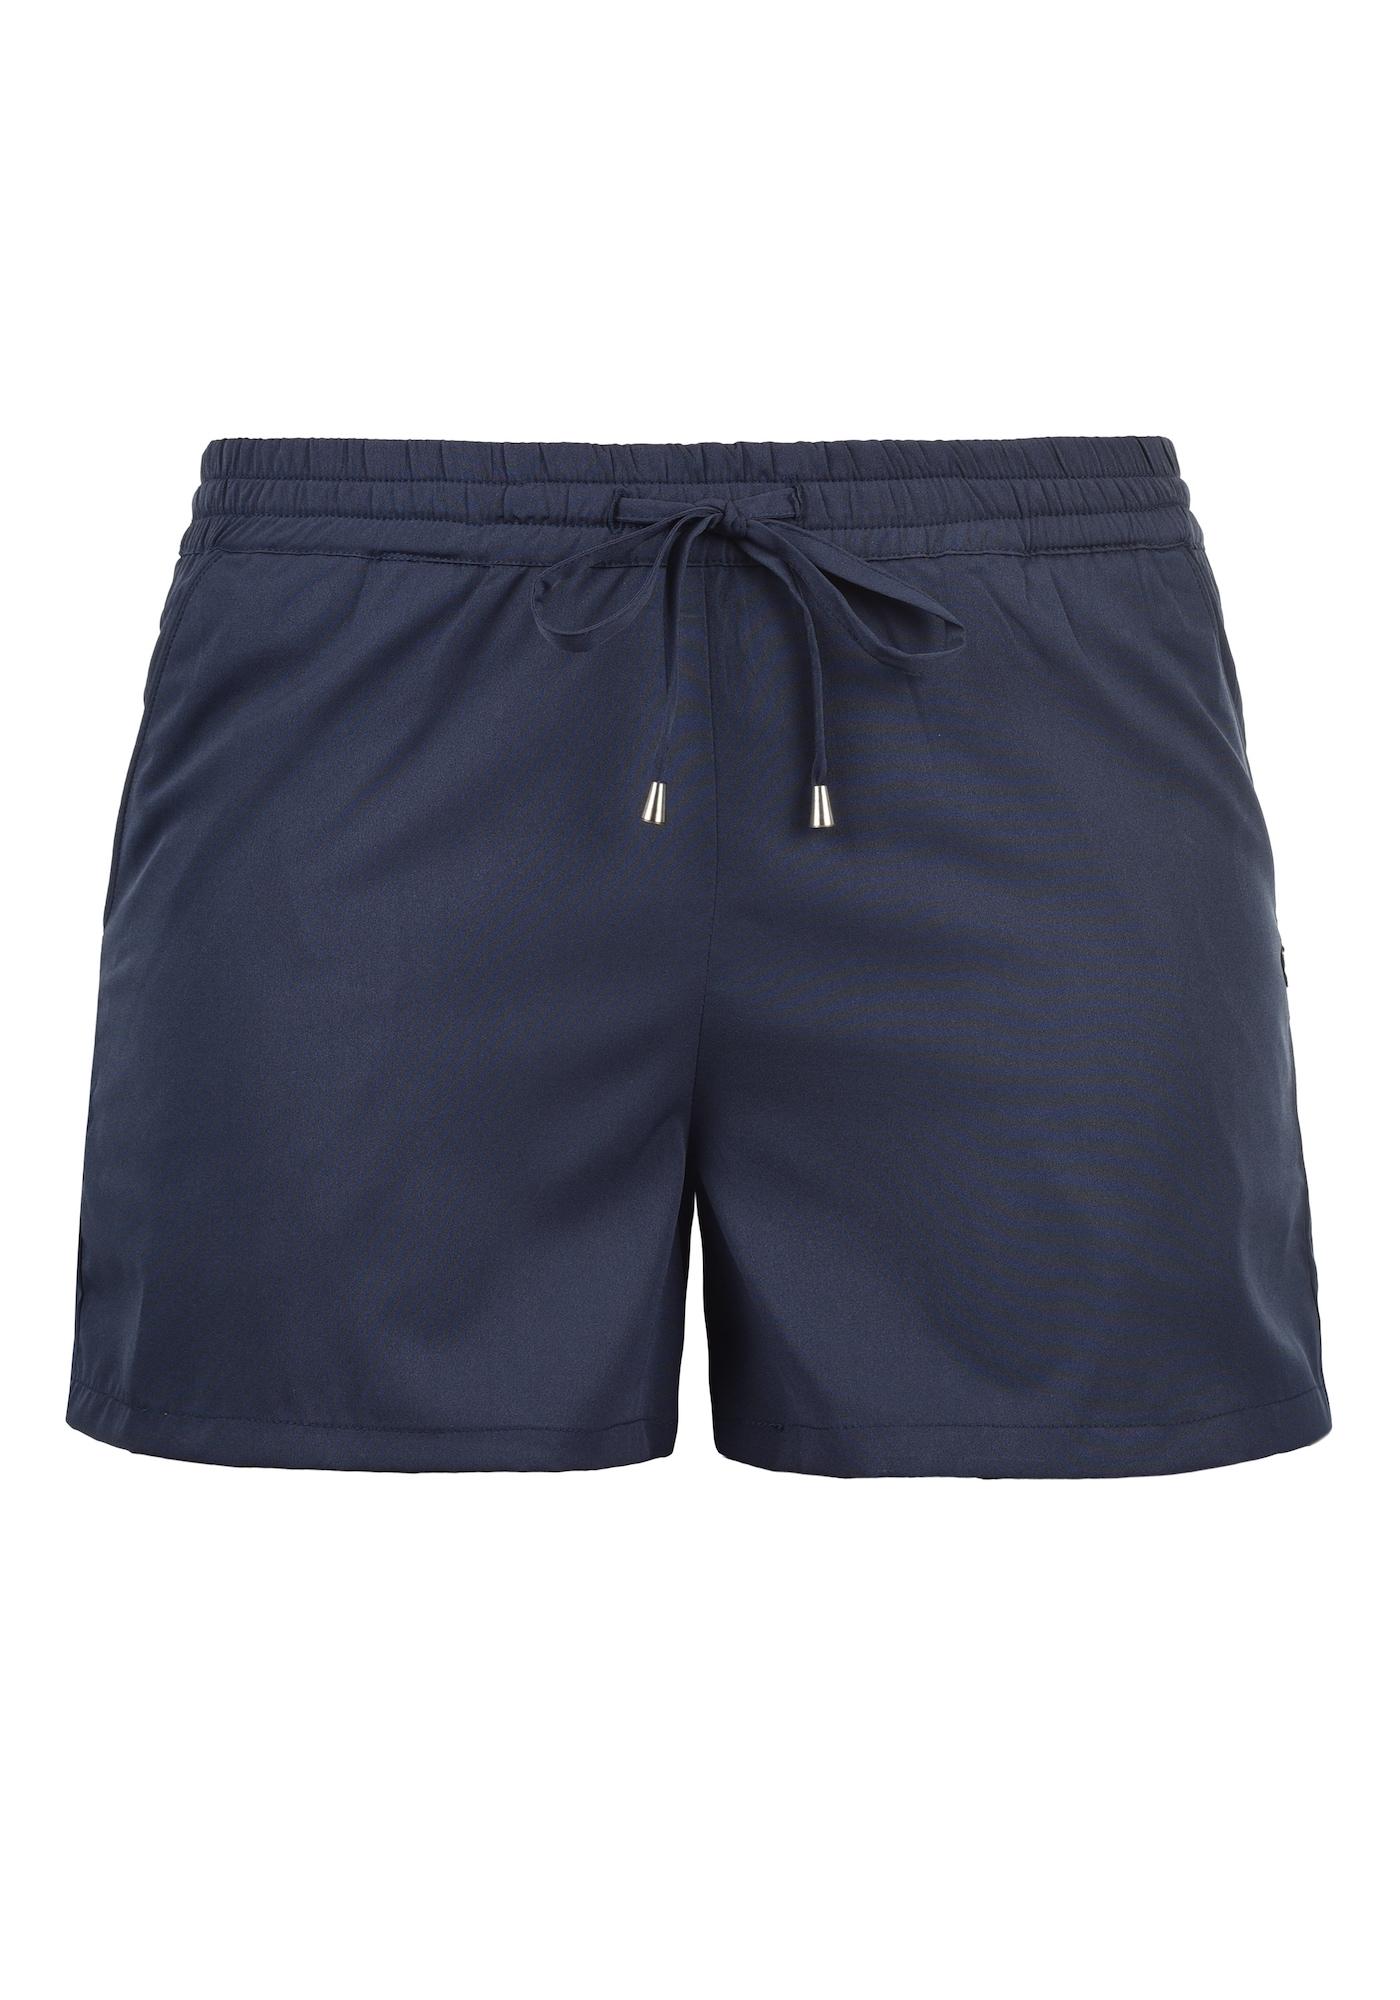 Shorts 'Amal' | Bekleidung > Hosen > Shorts & Bermudas | Blend She